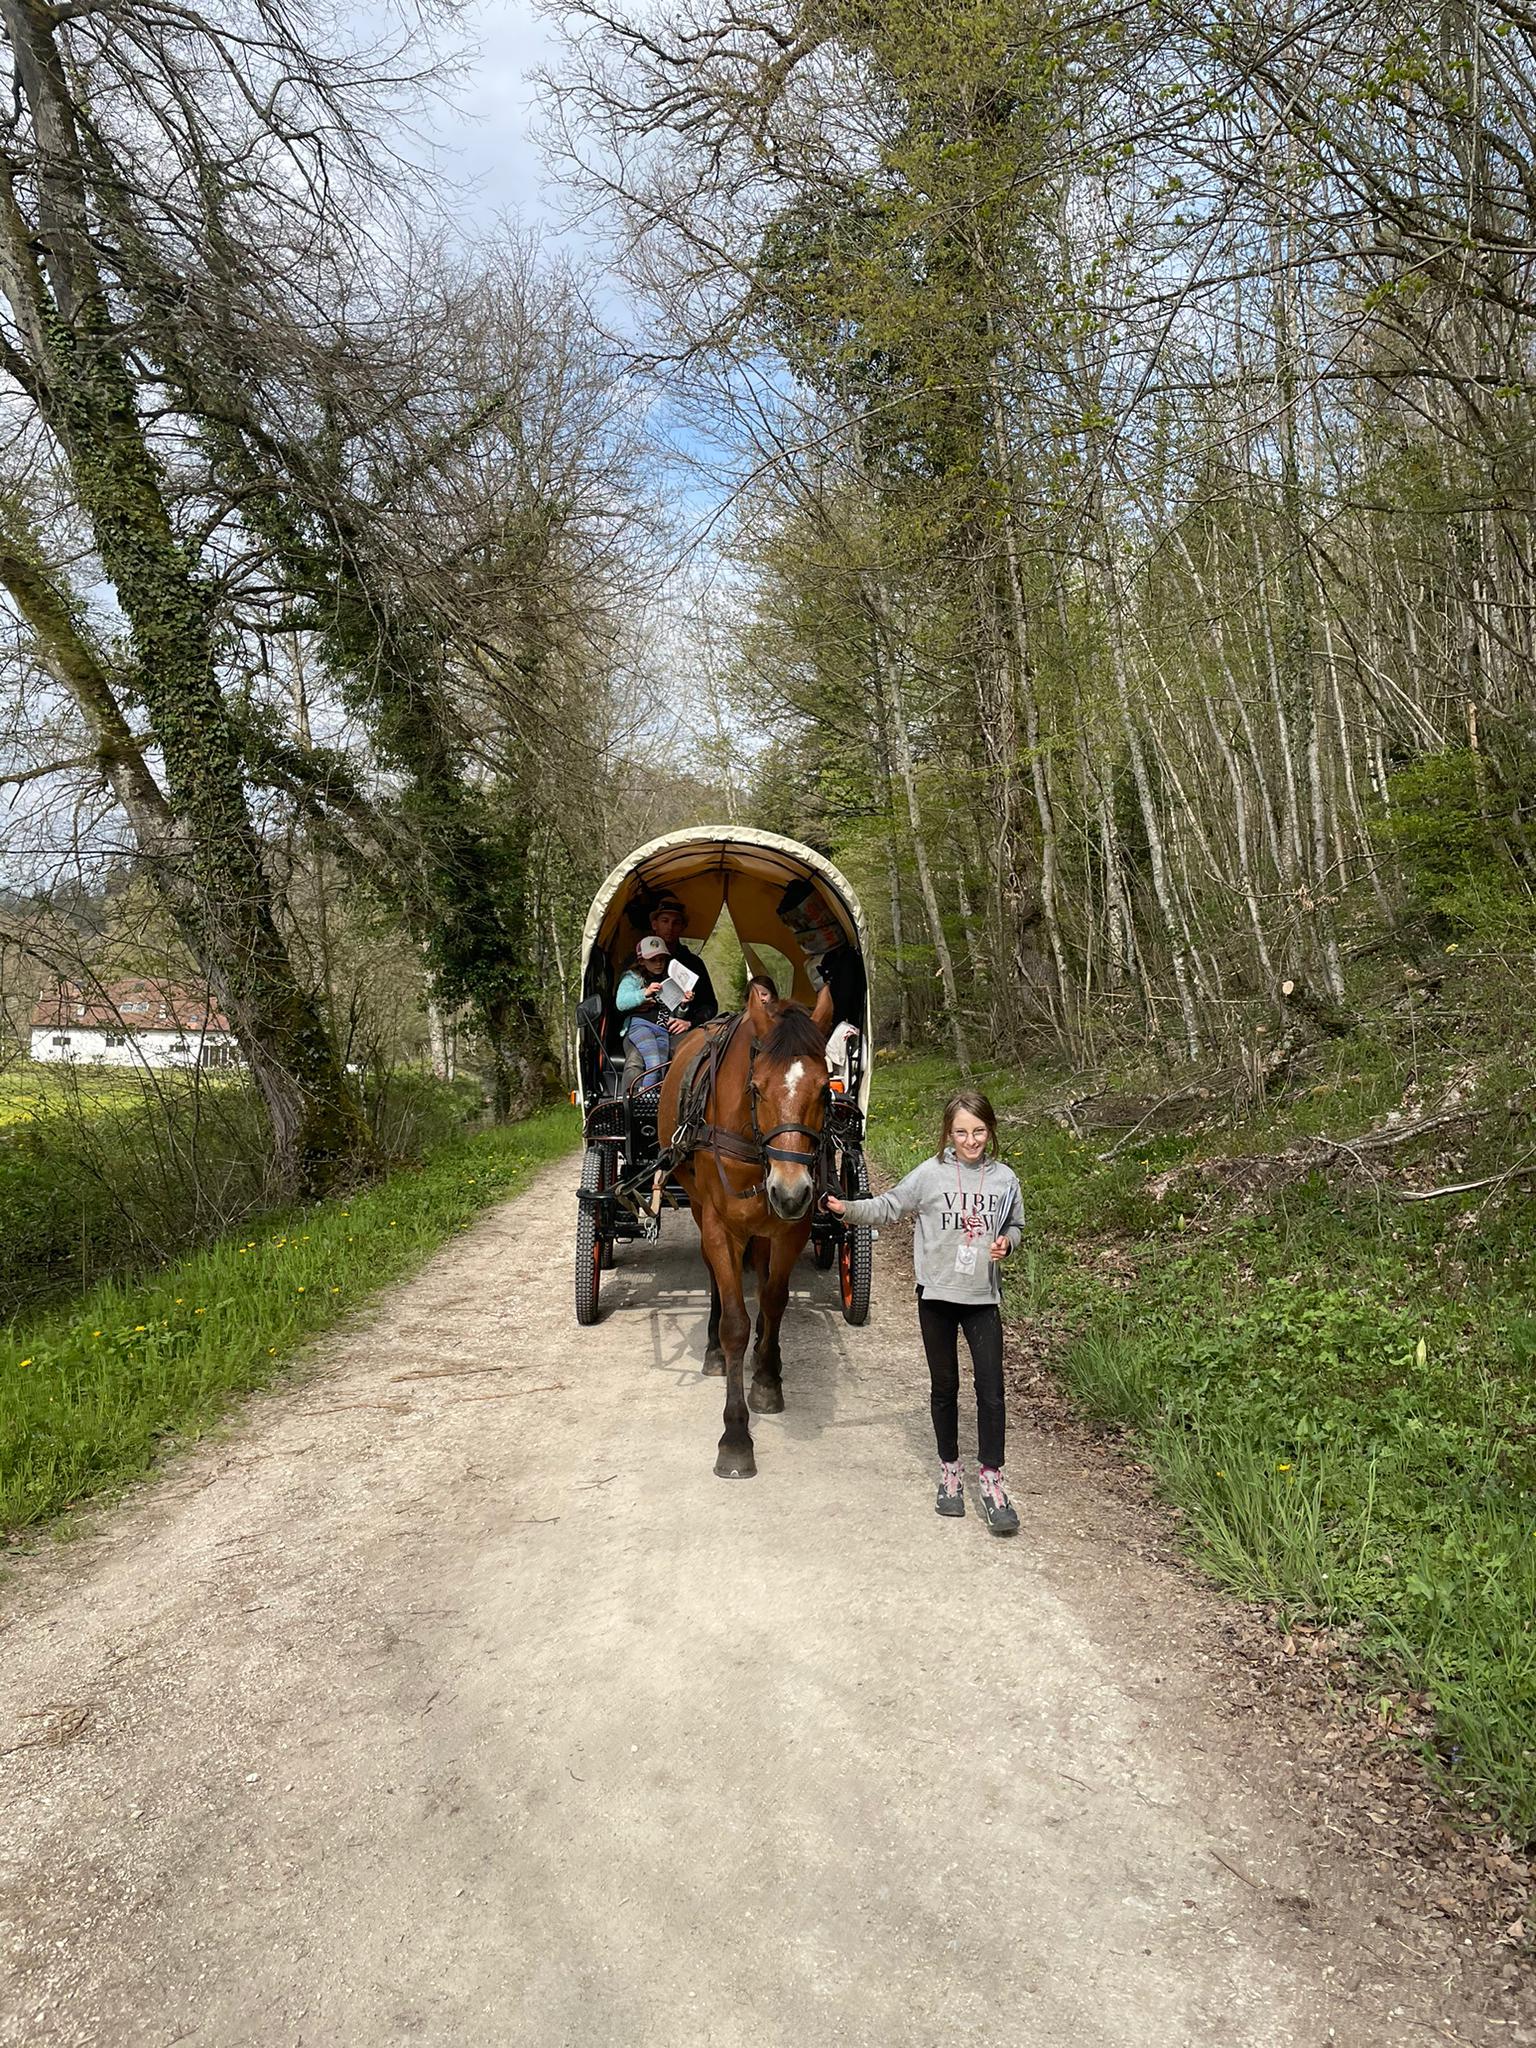 Voyage de la famille Cavadini: l'Ajoie